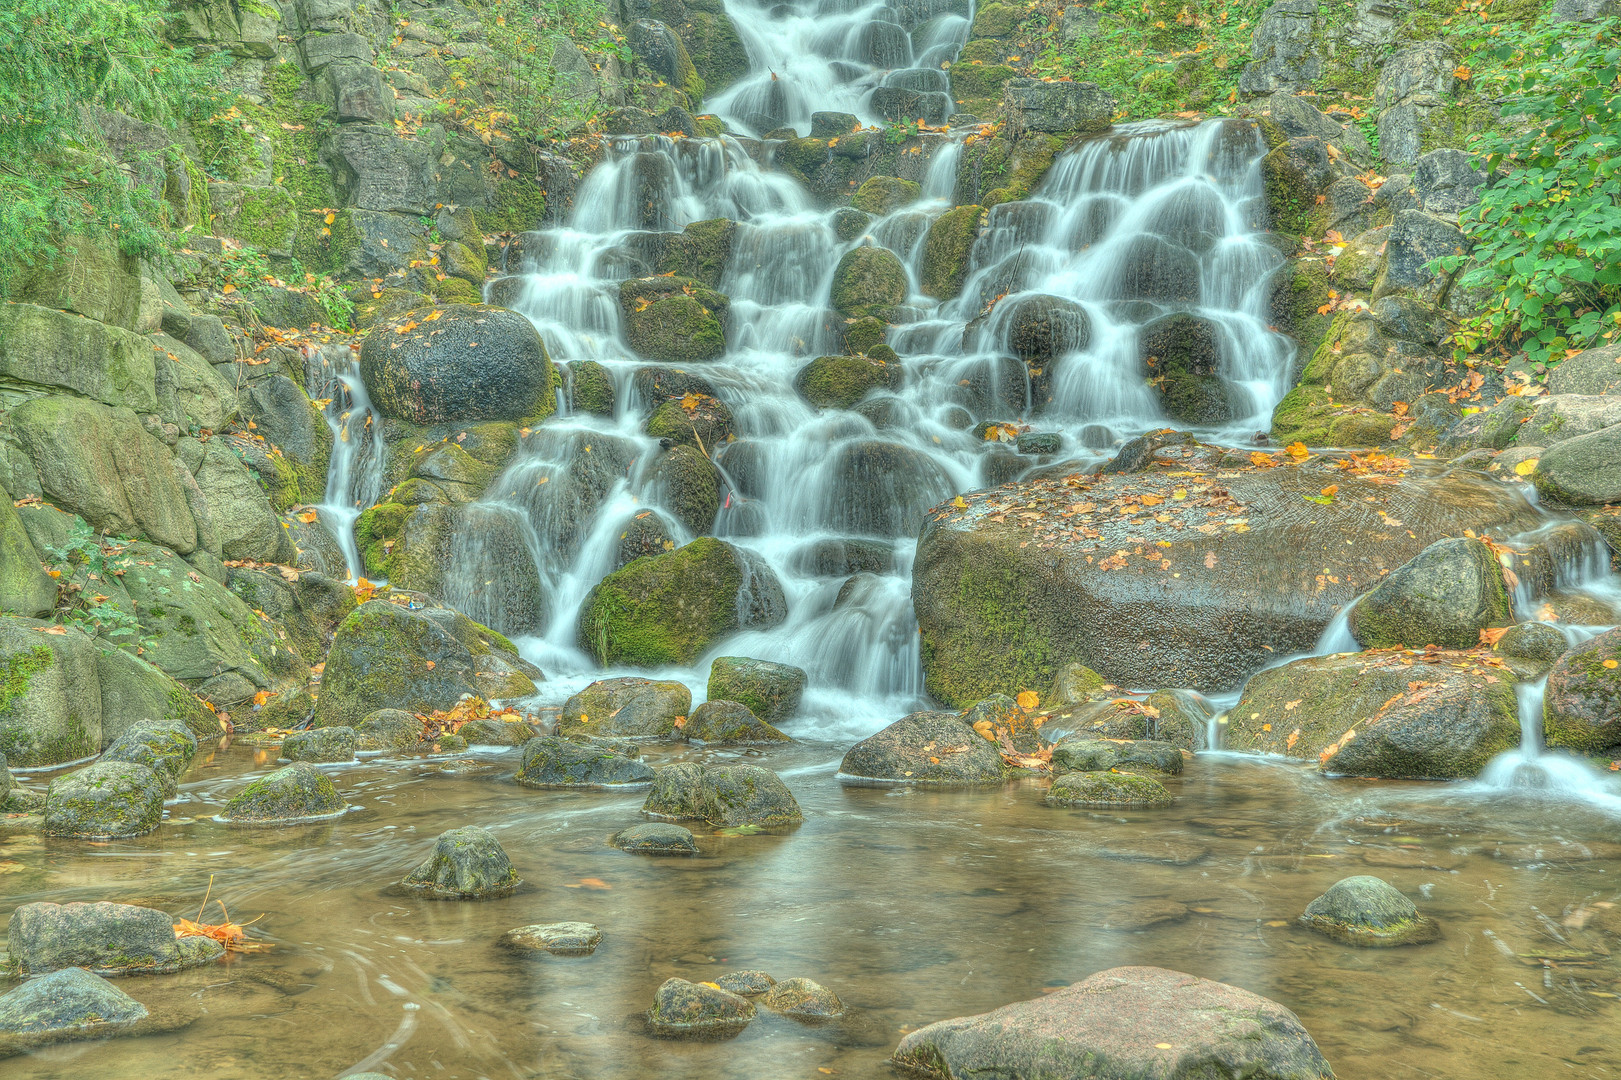 Wasserfall im Viktoriapark in Berlin Kreuzberg III